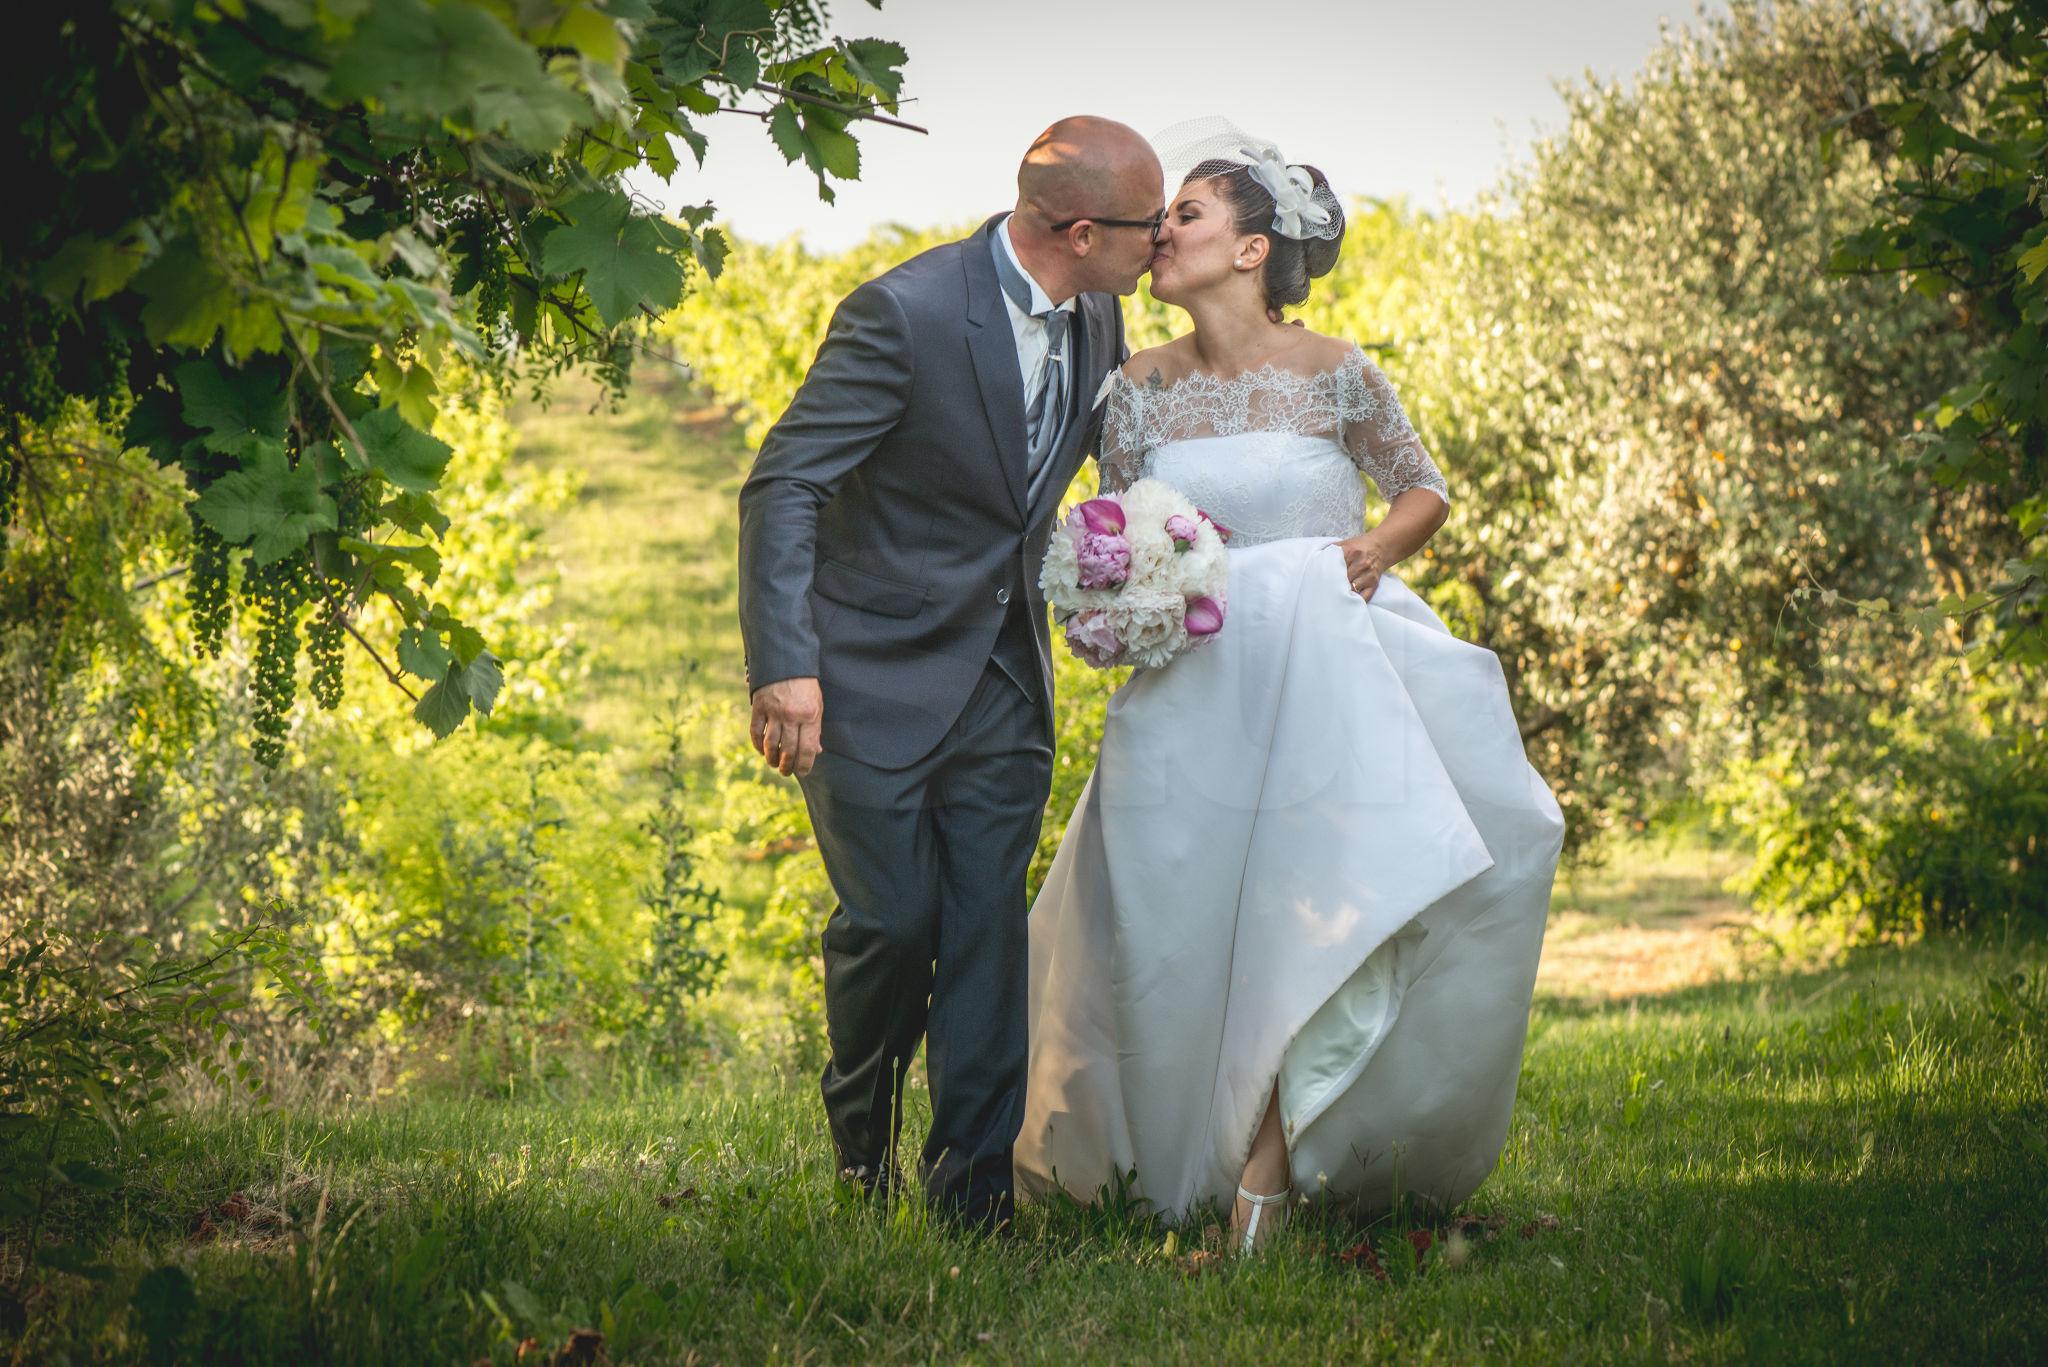 http://lnx.mirkone.it/wp-content/uploads/2015/07/fotografo-matrimoni-faenza-0005.jpg